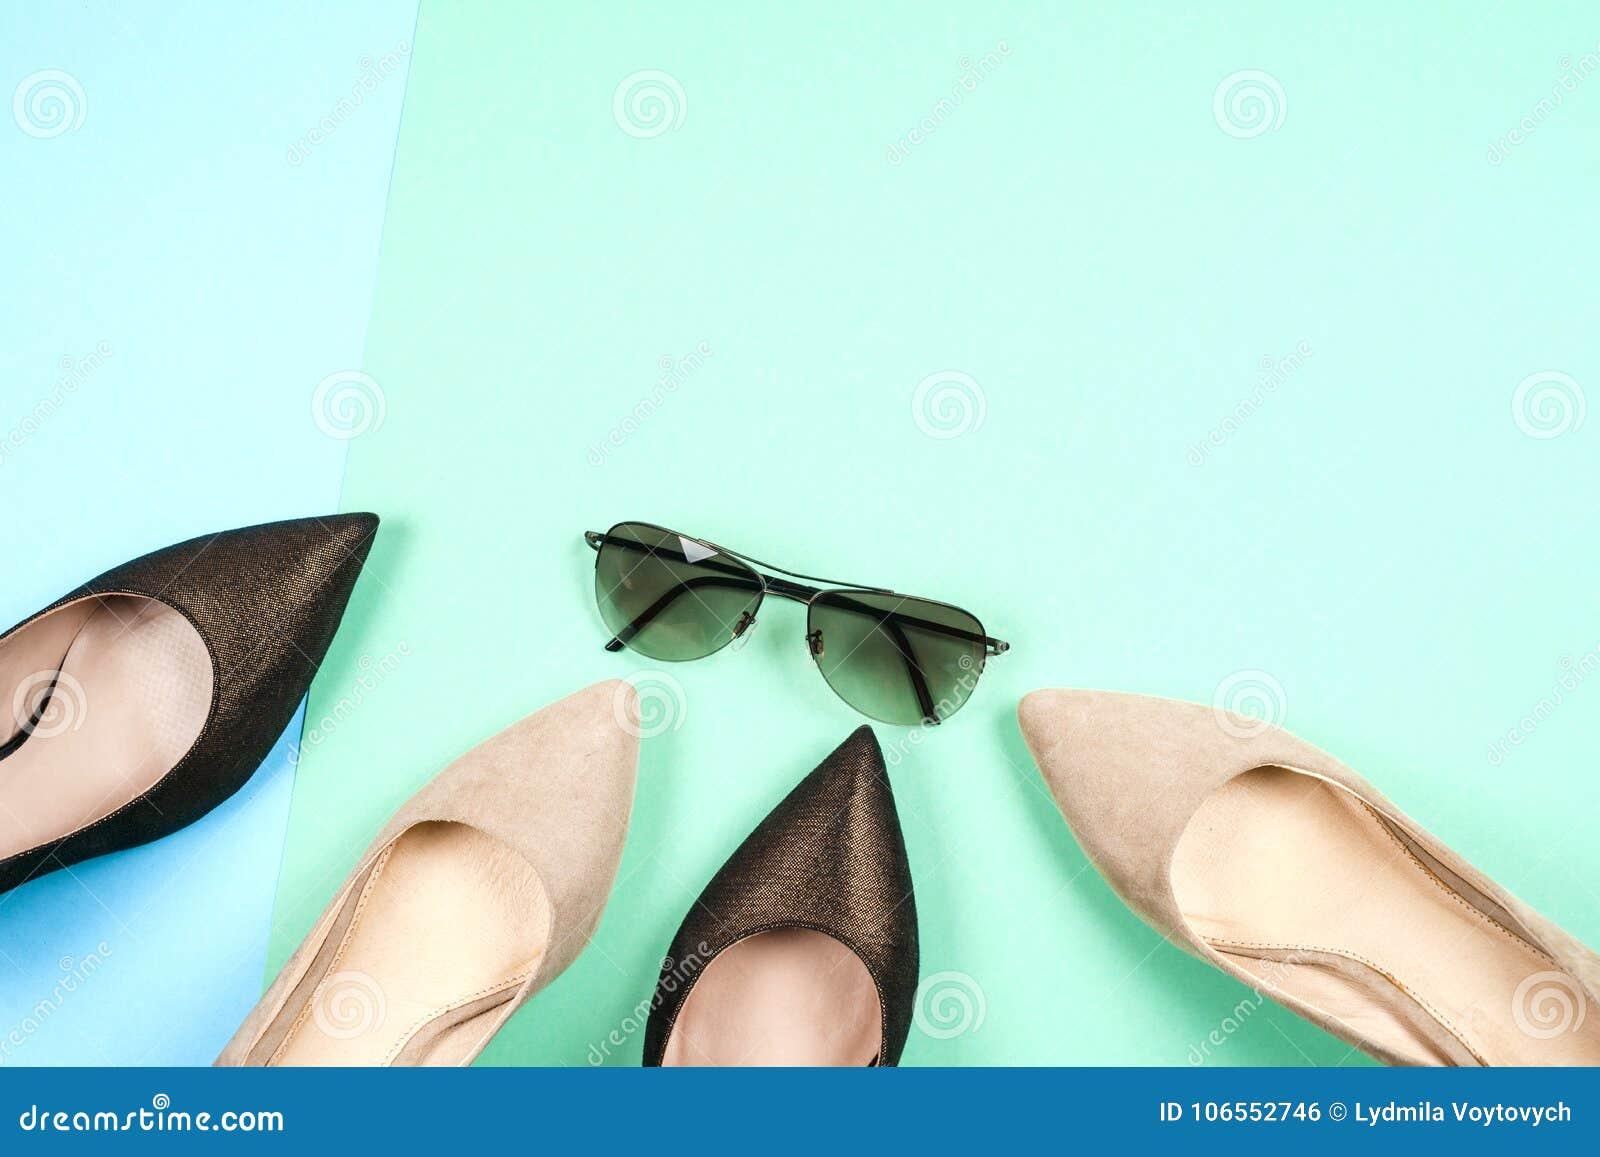 9024738f38c Μόδα, θηλυκά διαφορετικά παπούτσια στα υψηλά τακούνια Στοκ Εικόνες ...